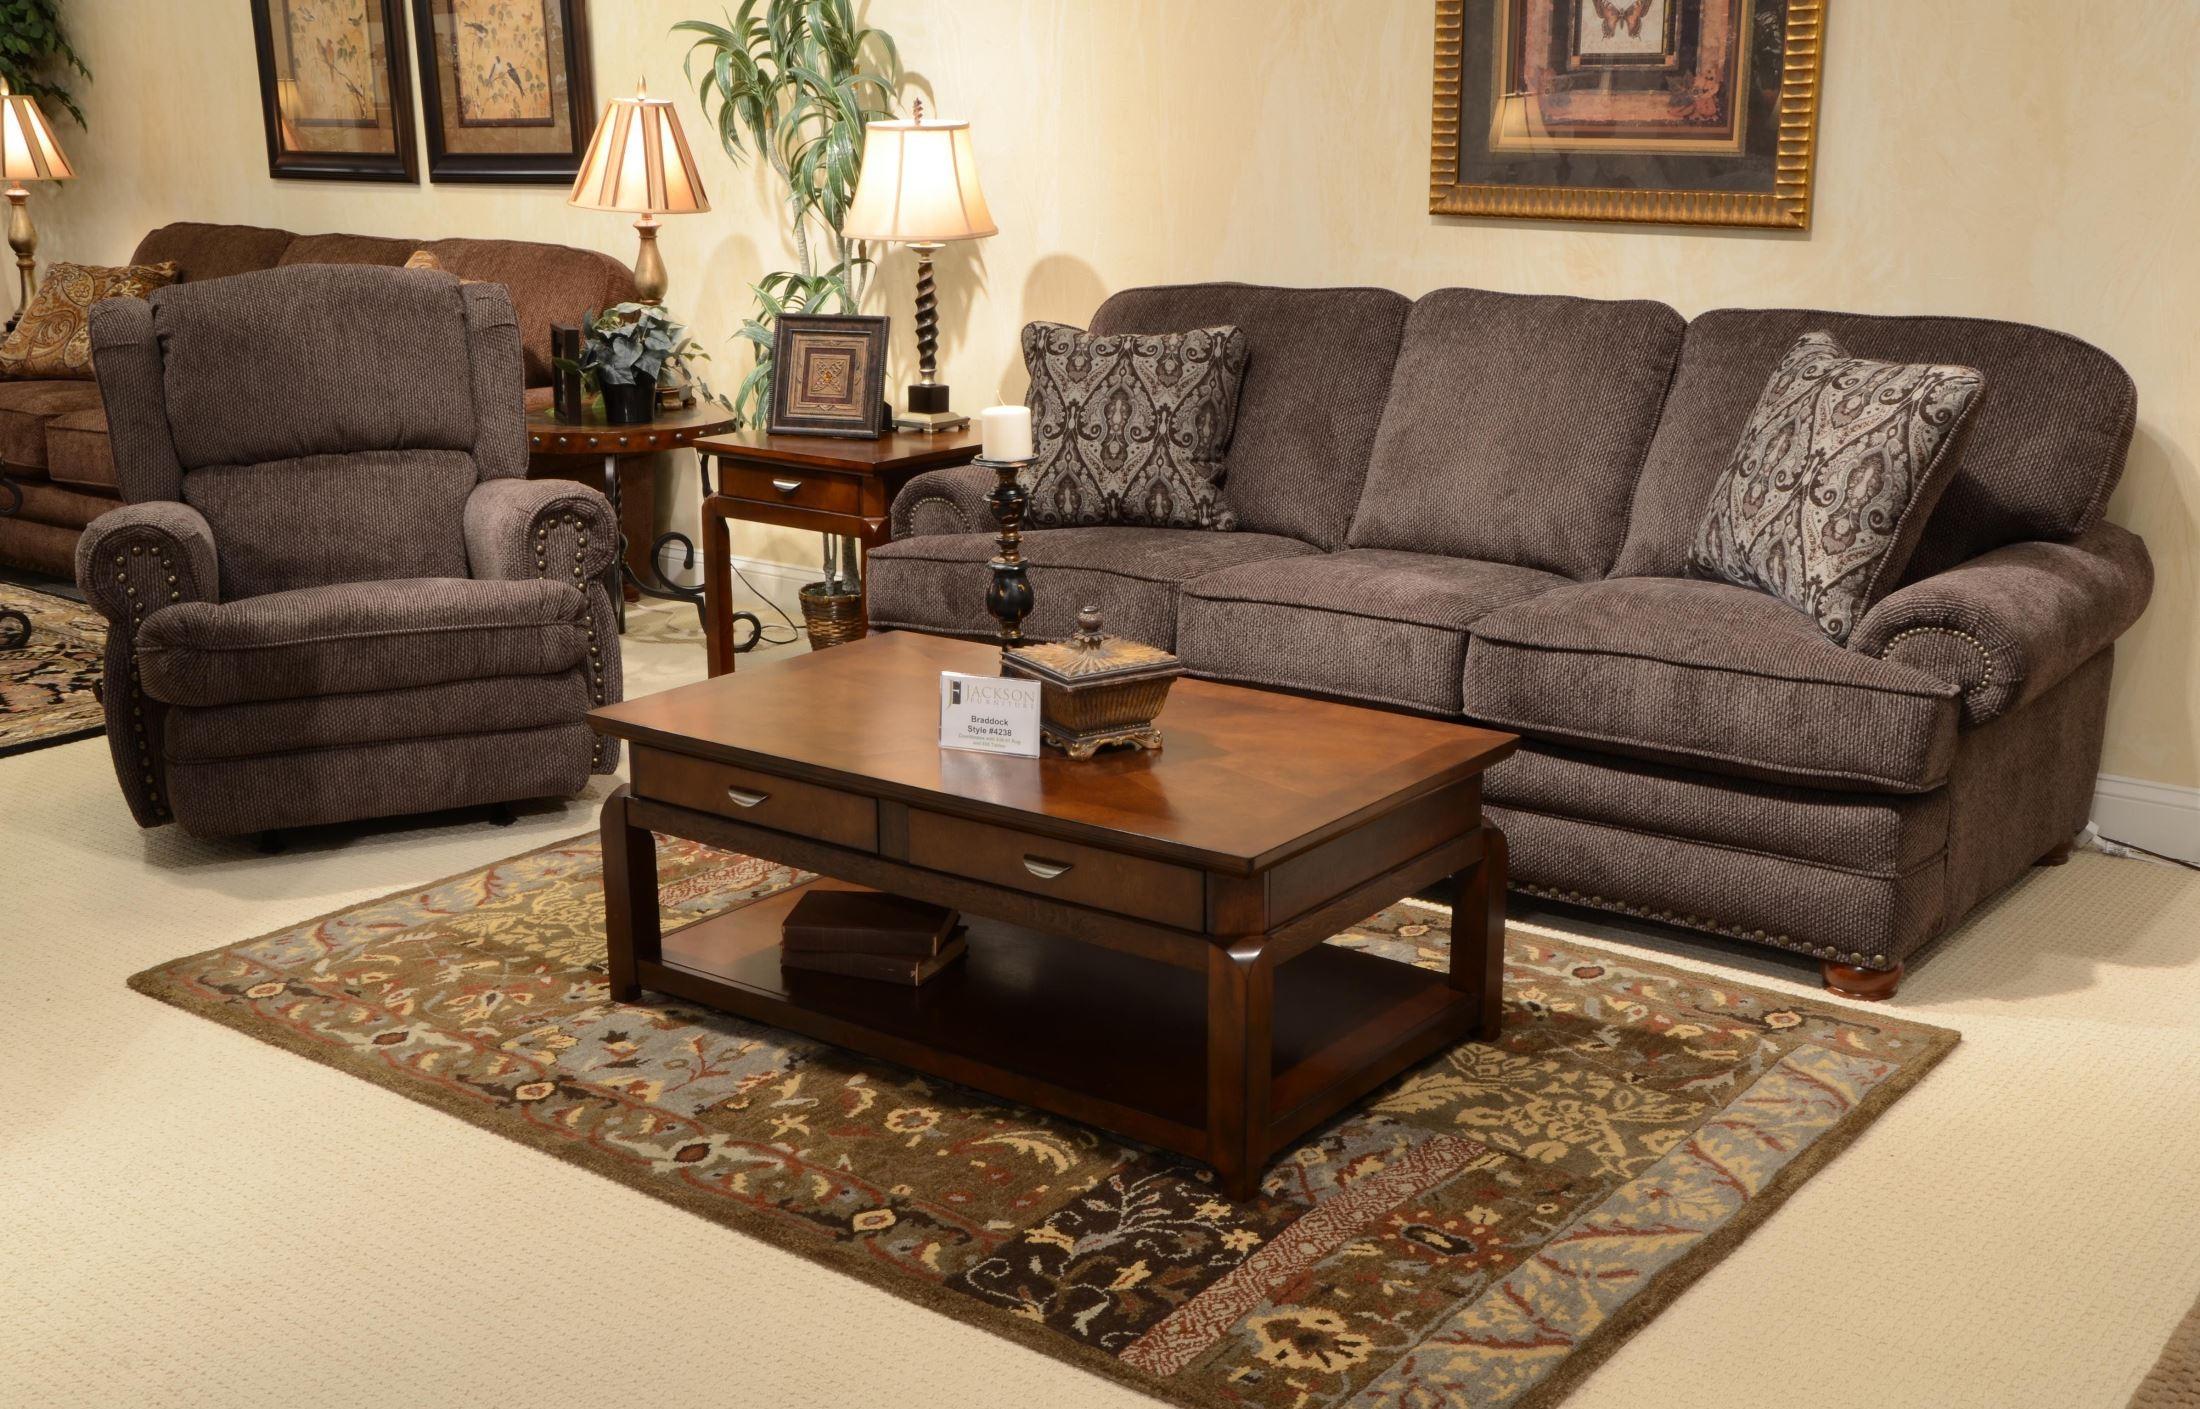 Braddock Metal Living Room Set From Jackson 423803000000000000 Coleman Fu